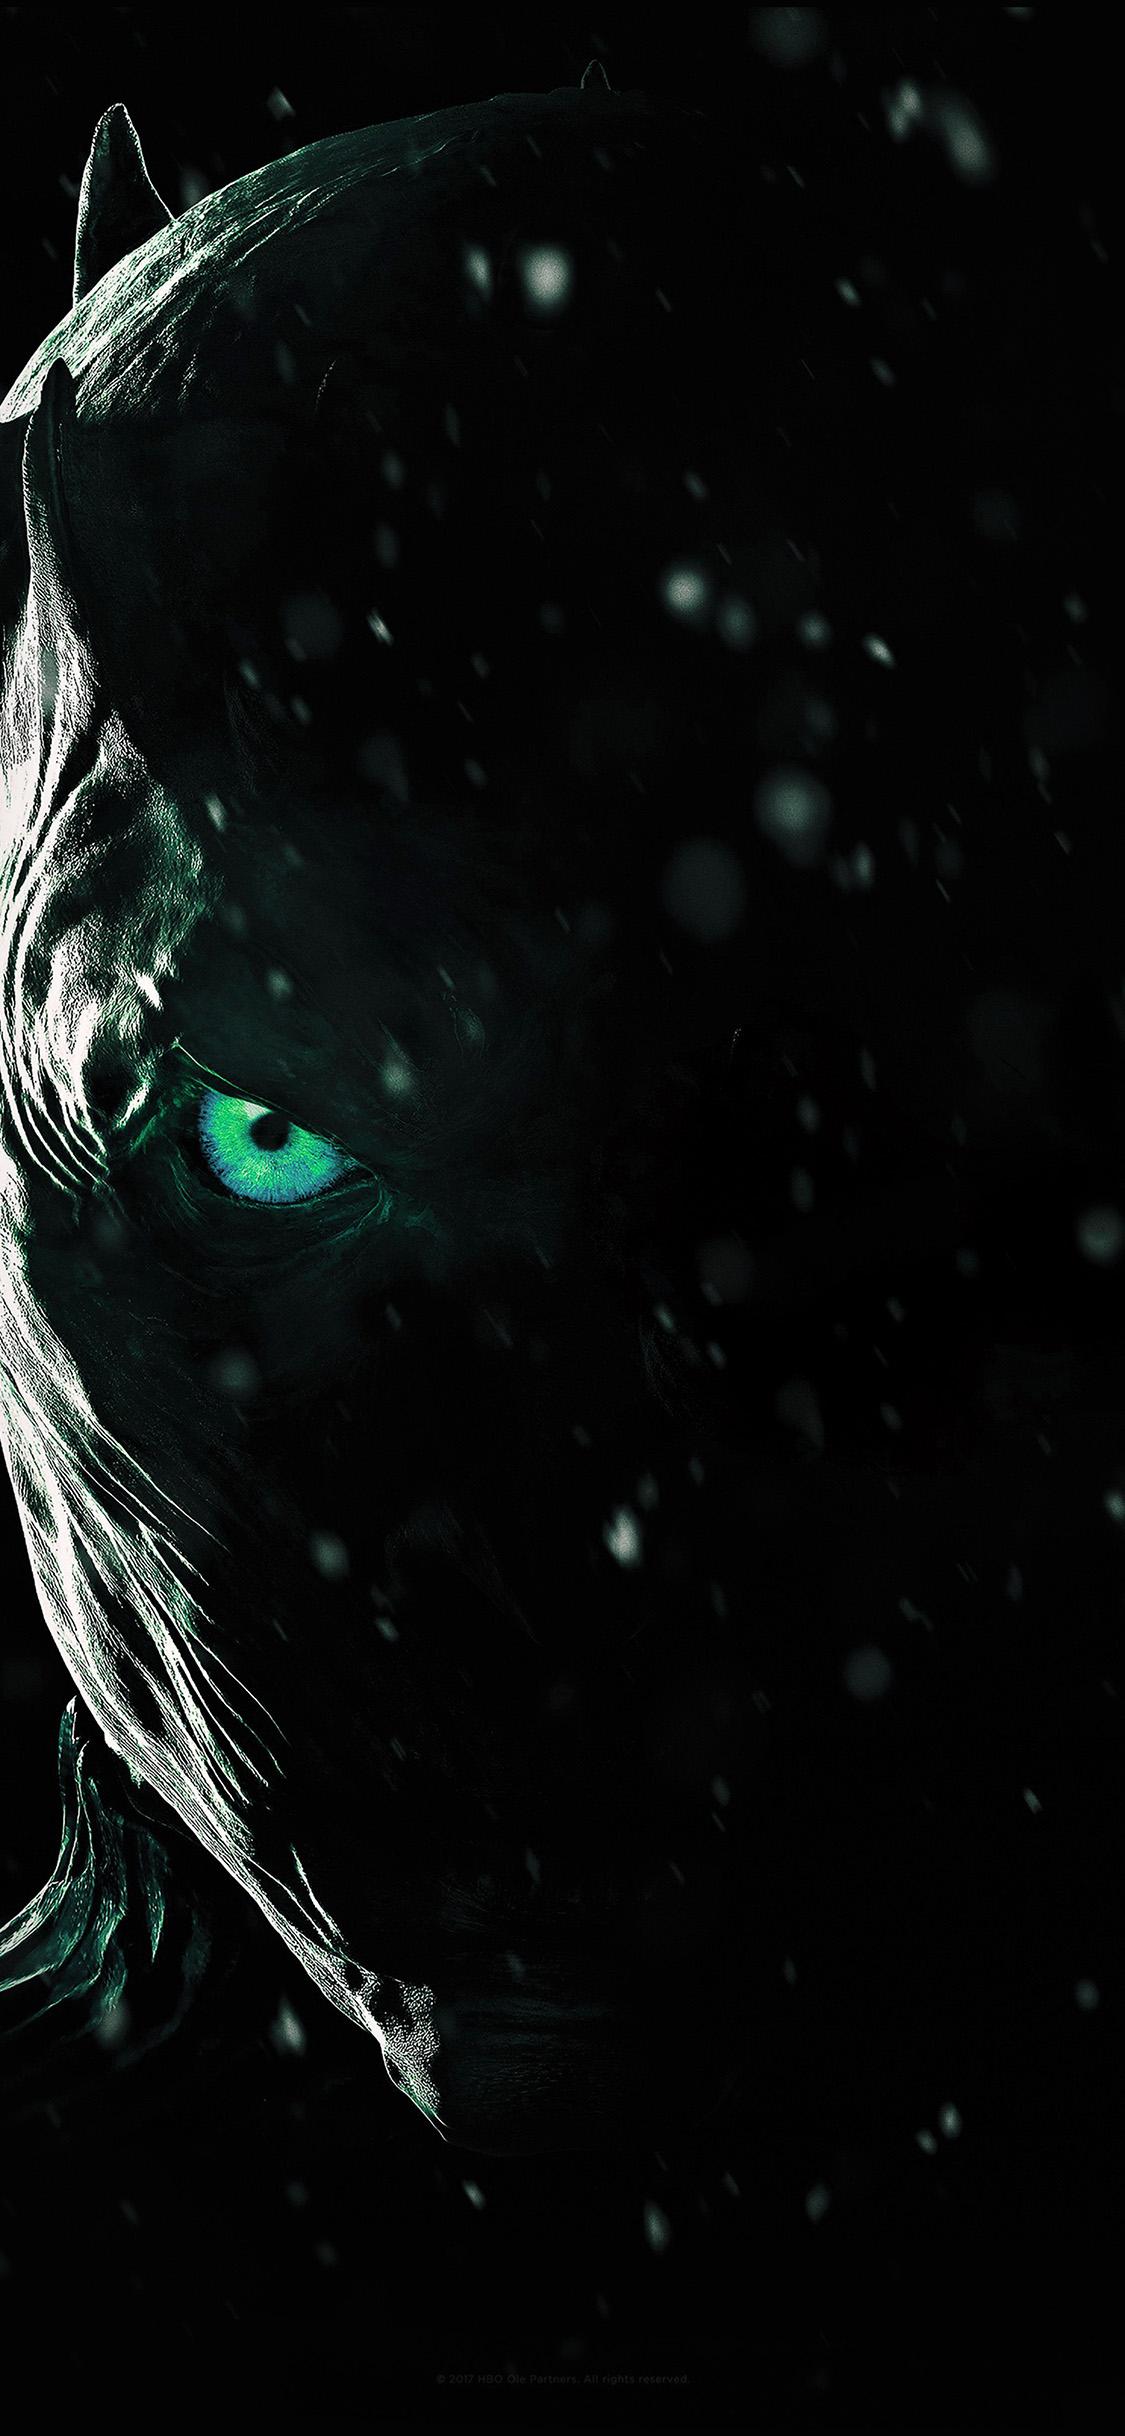 iPhonexpapers.com-Apple-iPhone-wallpaper-bf23-horror-scary-face-dark-anime-eye-art